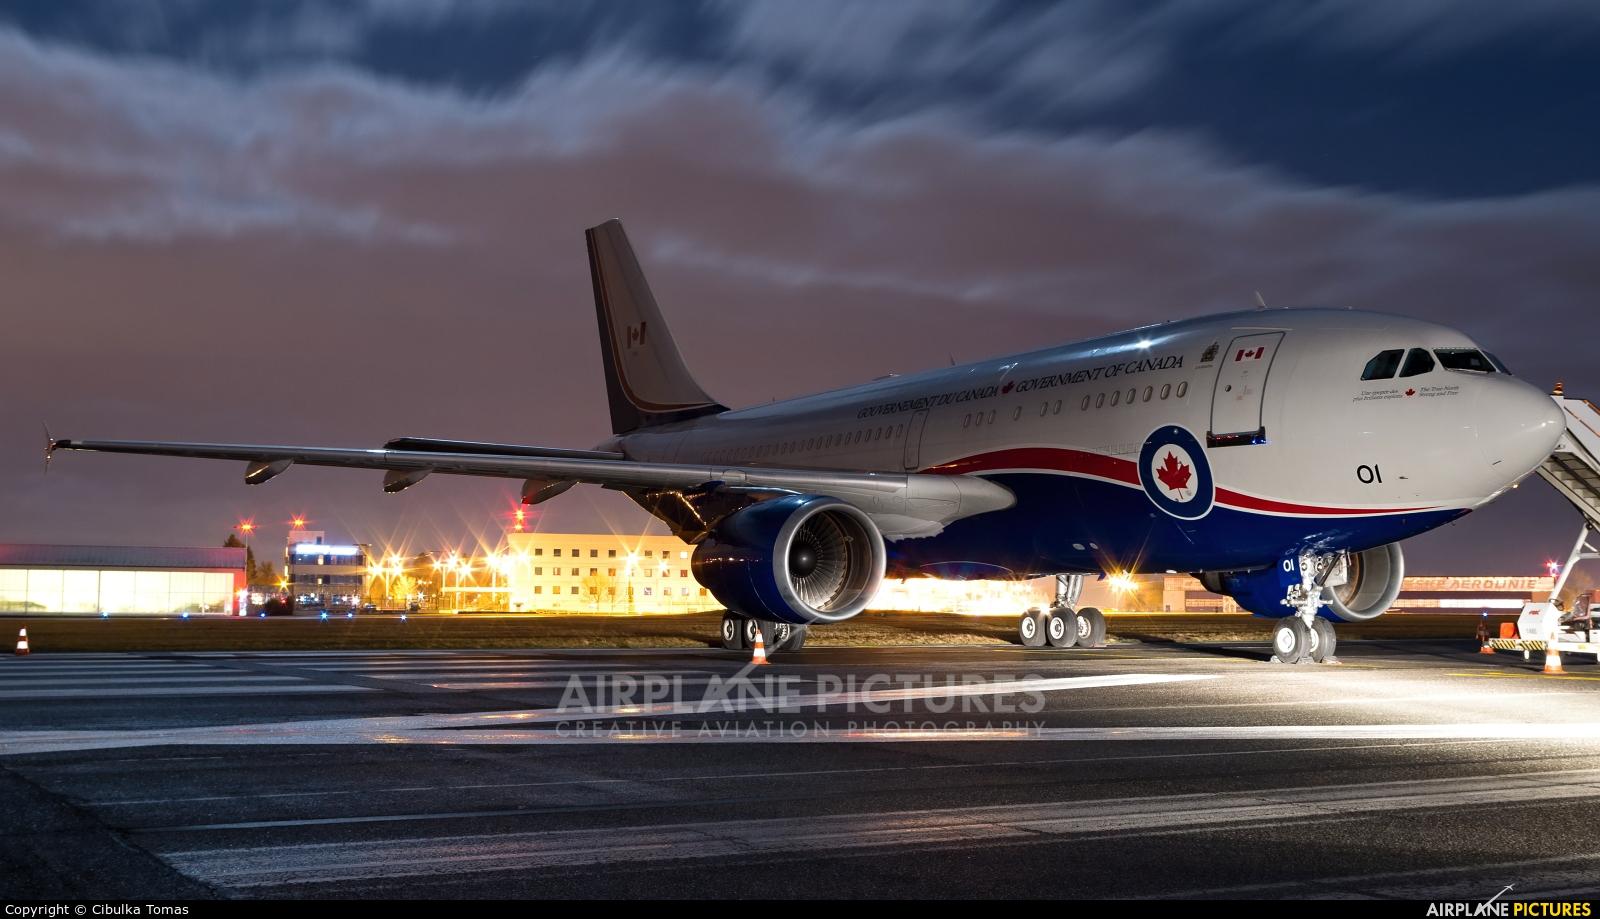 Canada - Air Force 15001 aircraft at Prague - Václav Havel